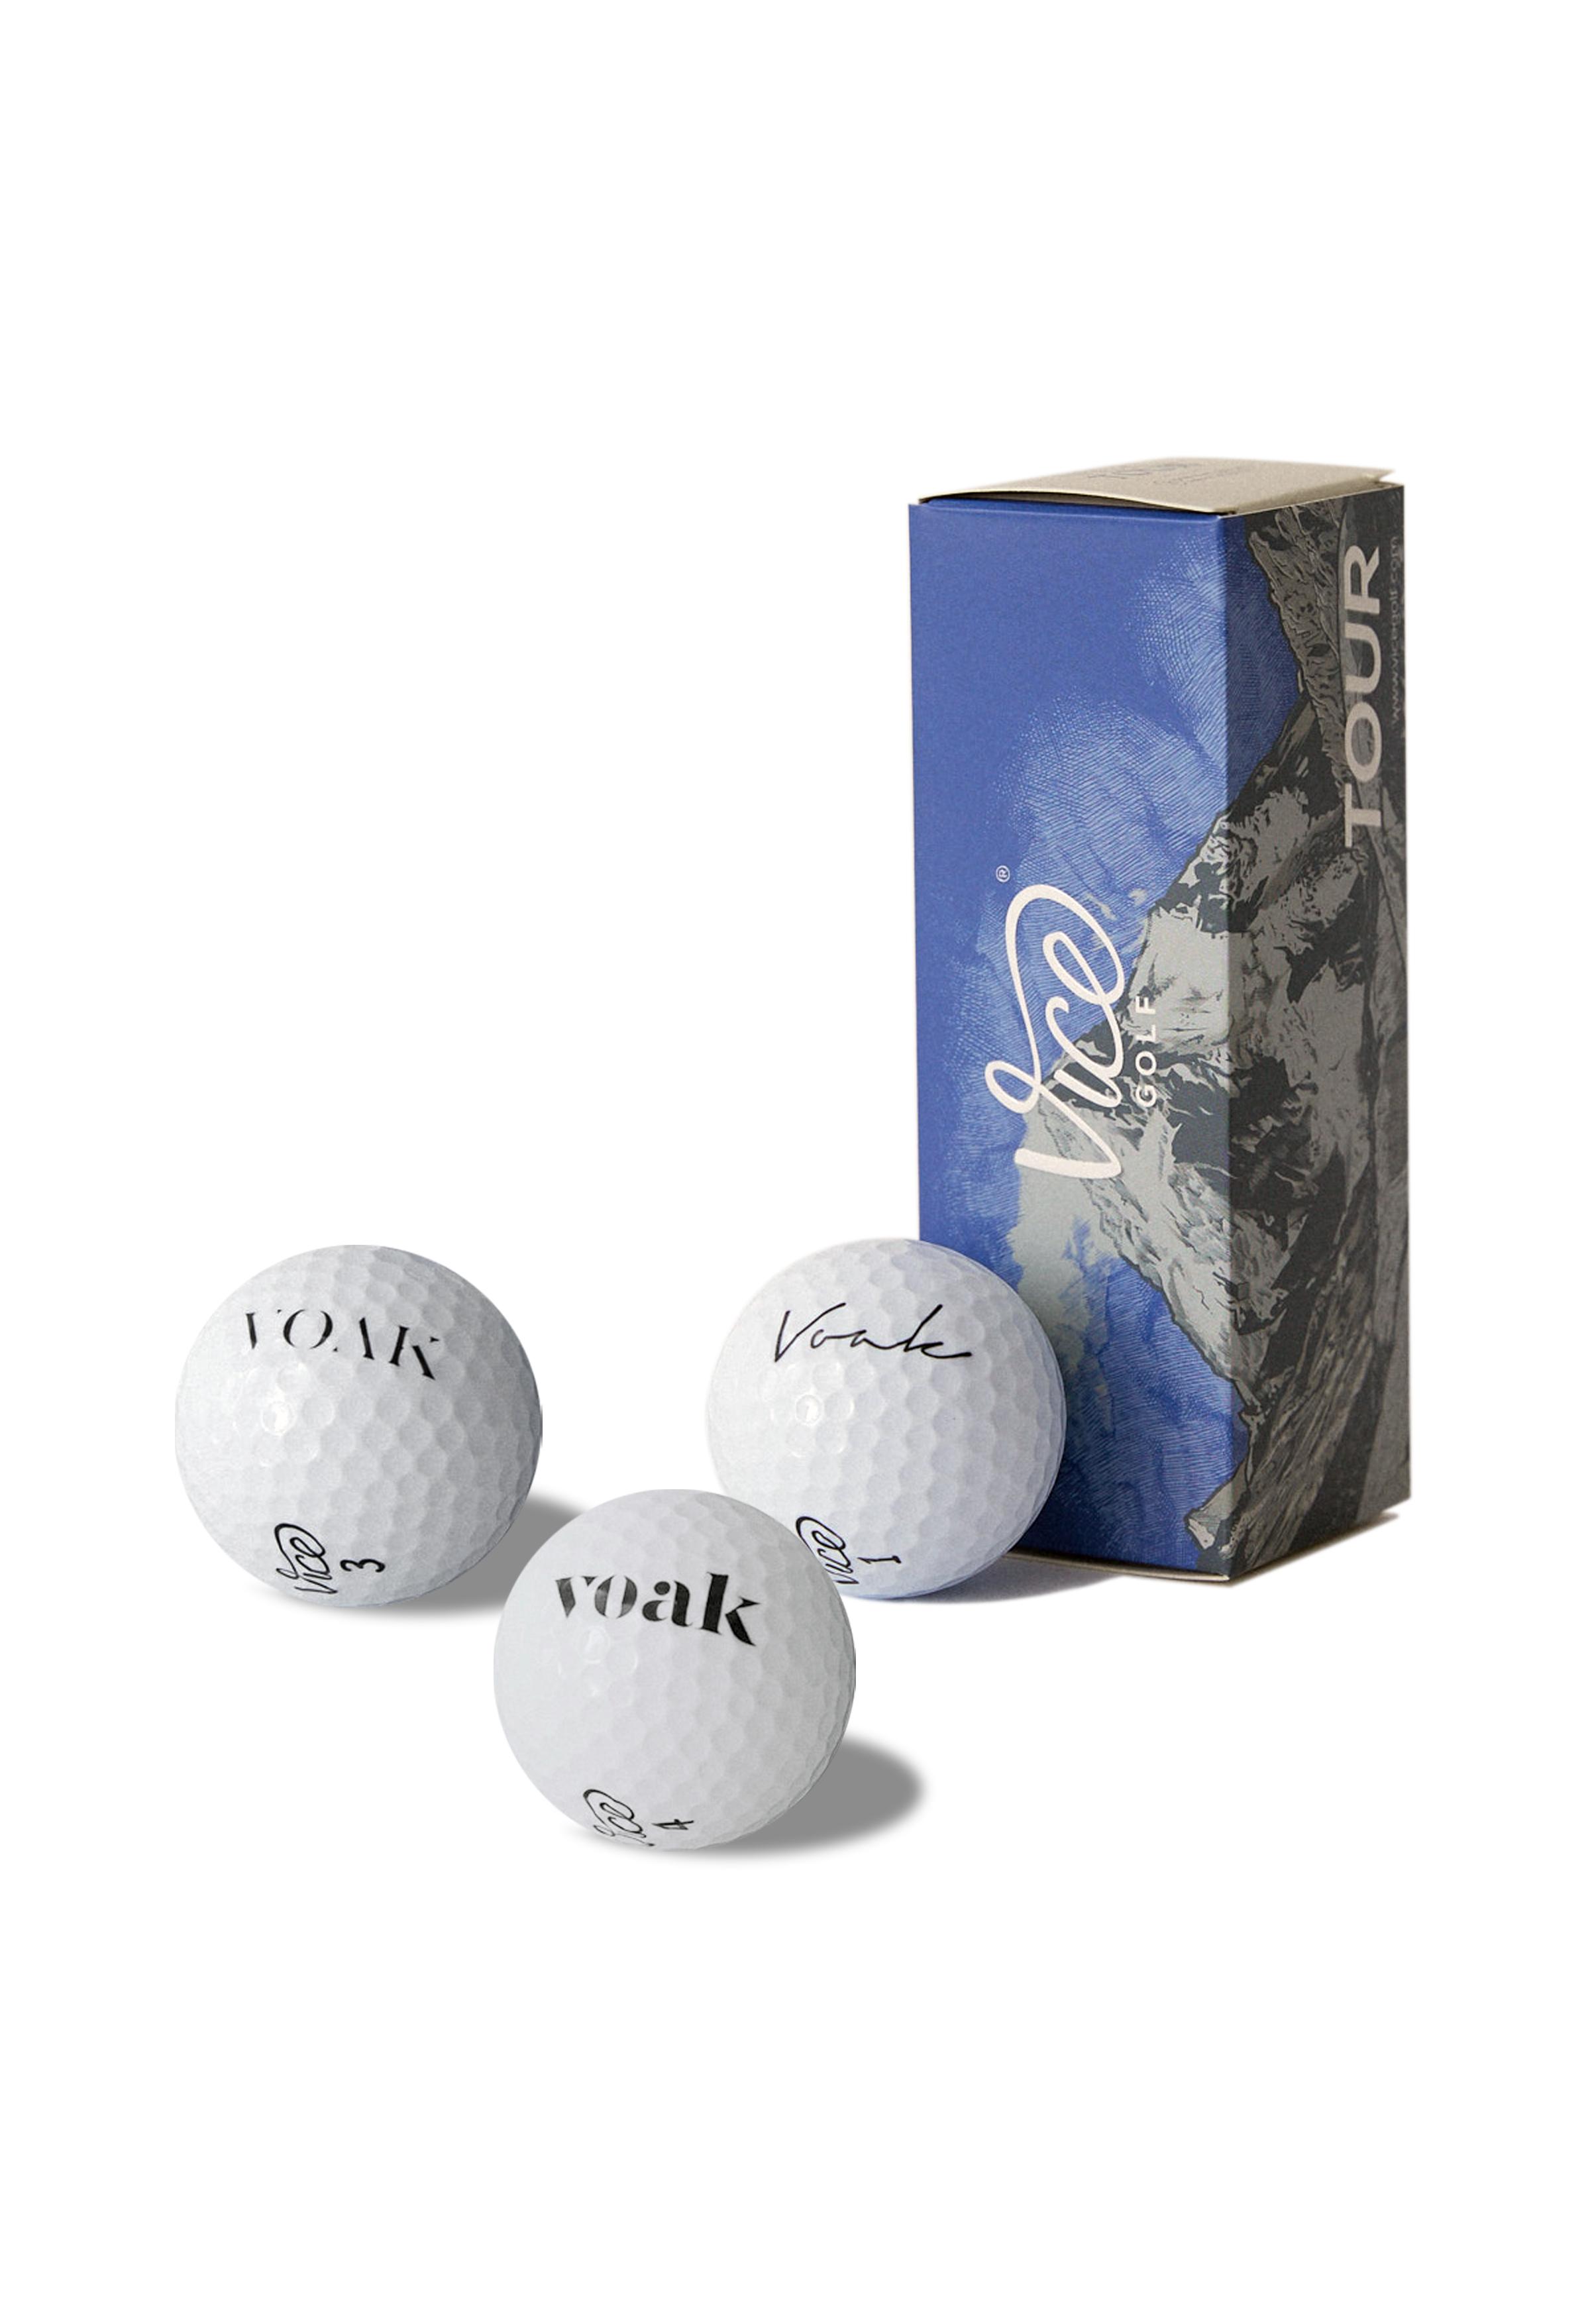 Vice Golf x Voak Sportswear Tour Golf Balls